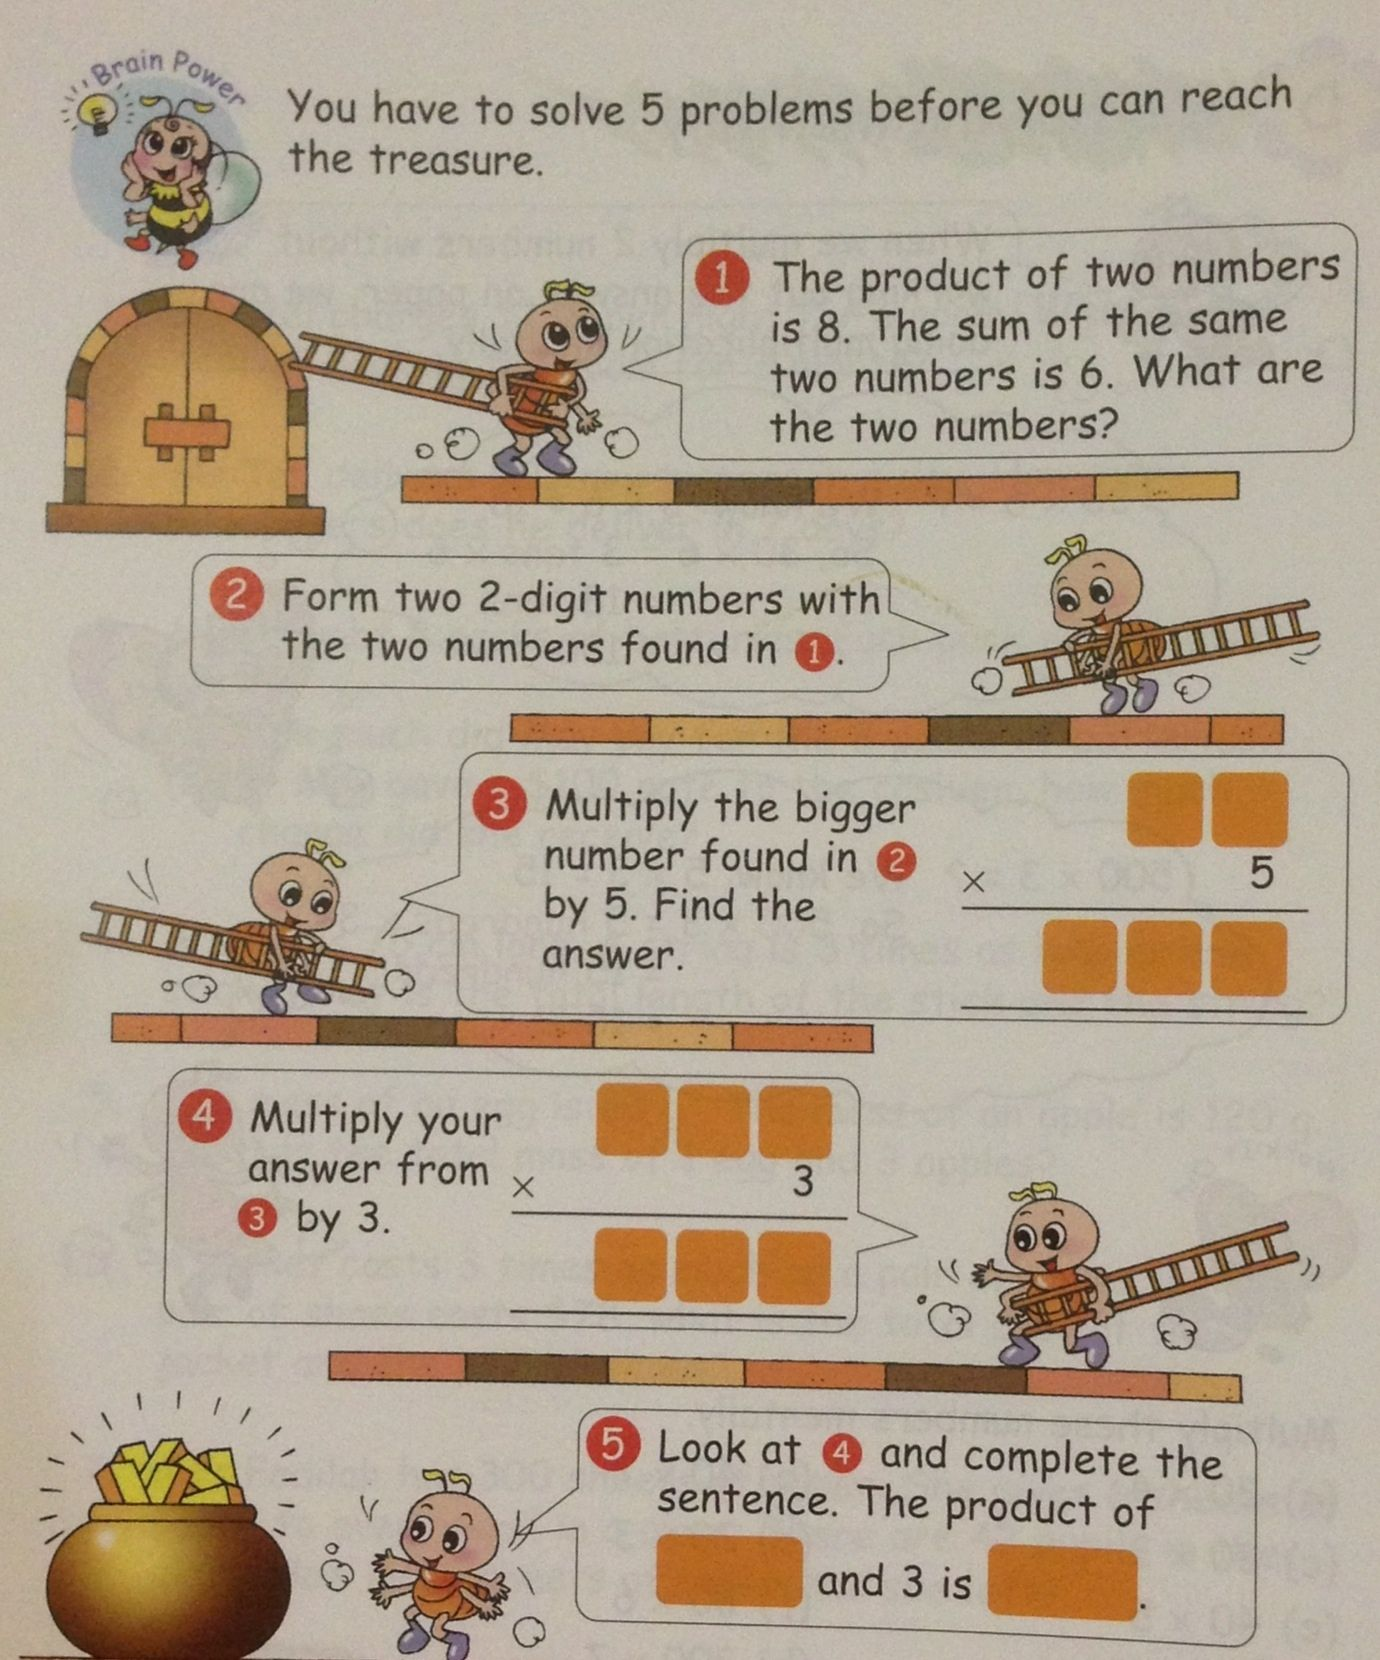 hight resolution of A grade 3 item on mental multiplication. Singapore math   Singapore math